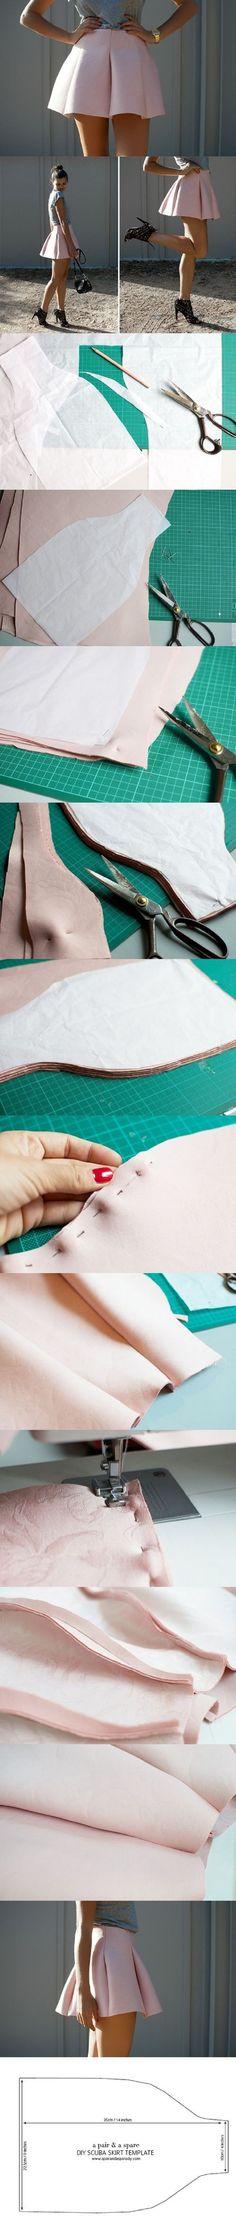 Scuba Mini Skirt Tutorial - 15 Chic Winter Fashion DIYs That Are Totally Easy | GleamItUp